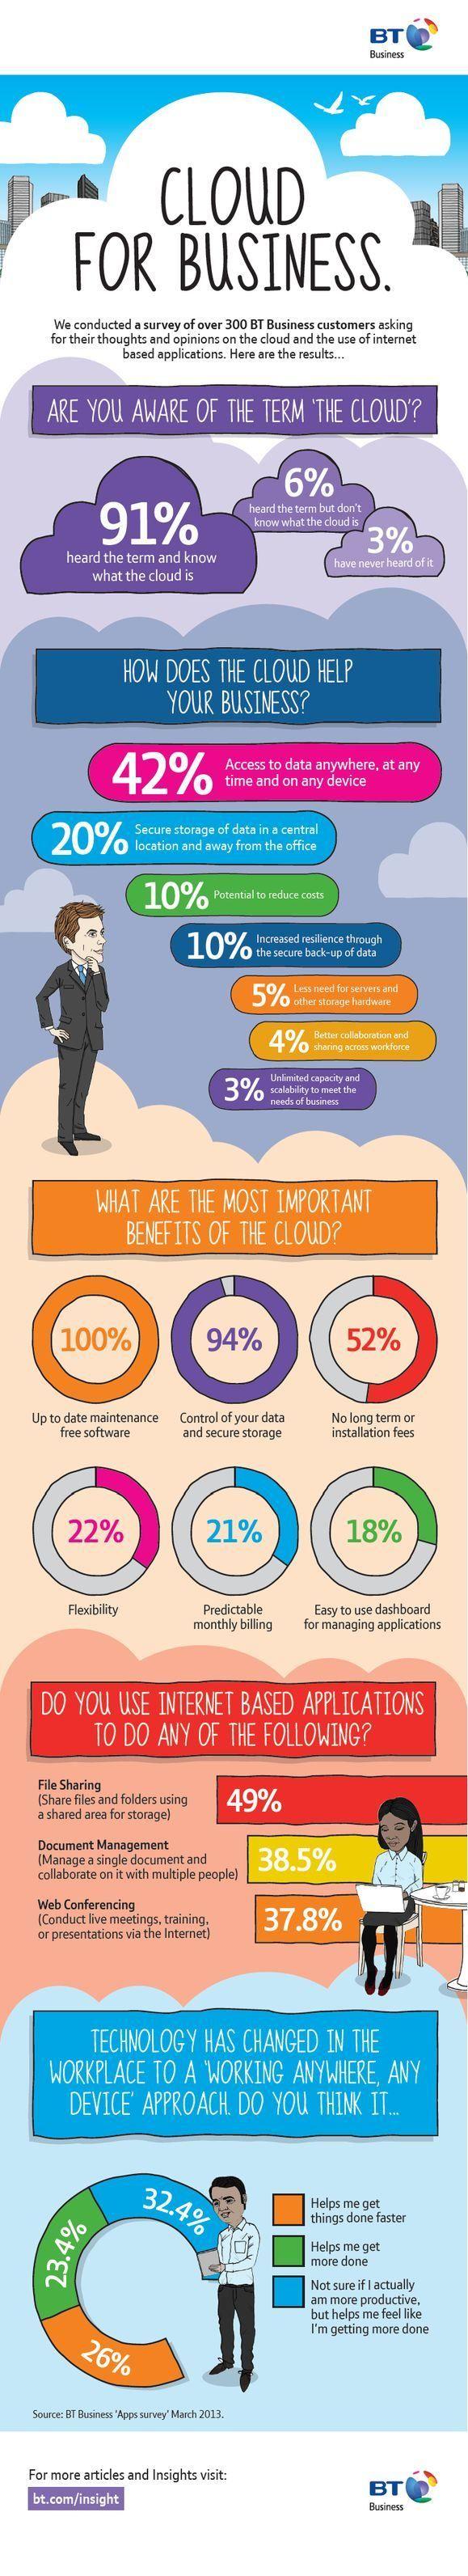 Cloud for business #infografia #infographic #internet